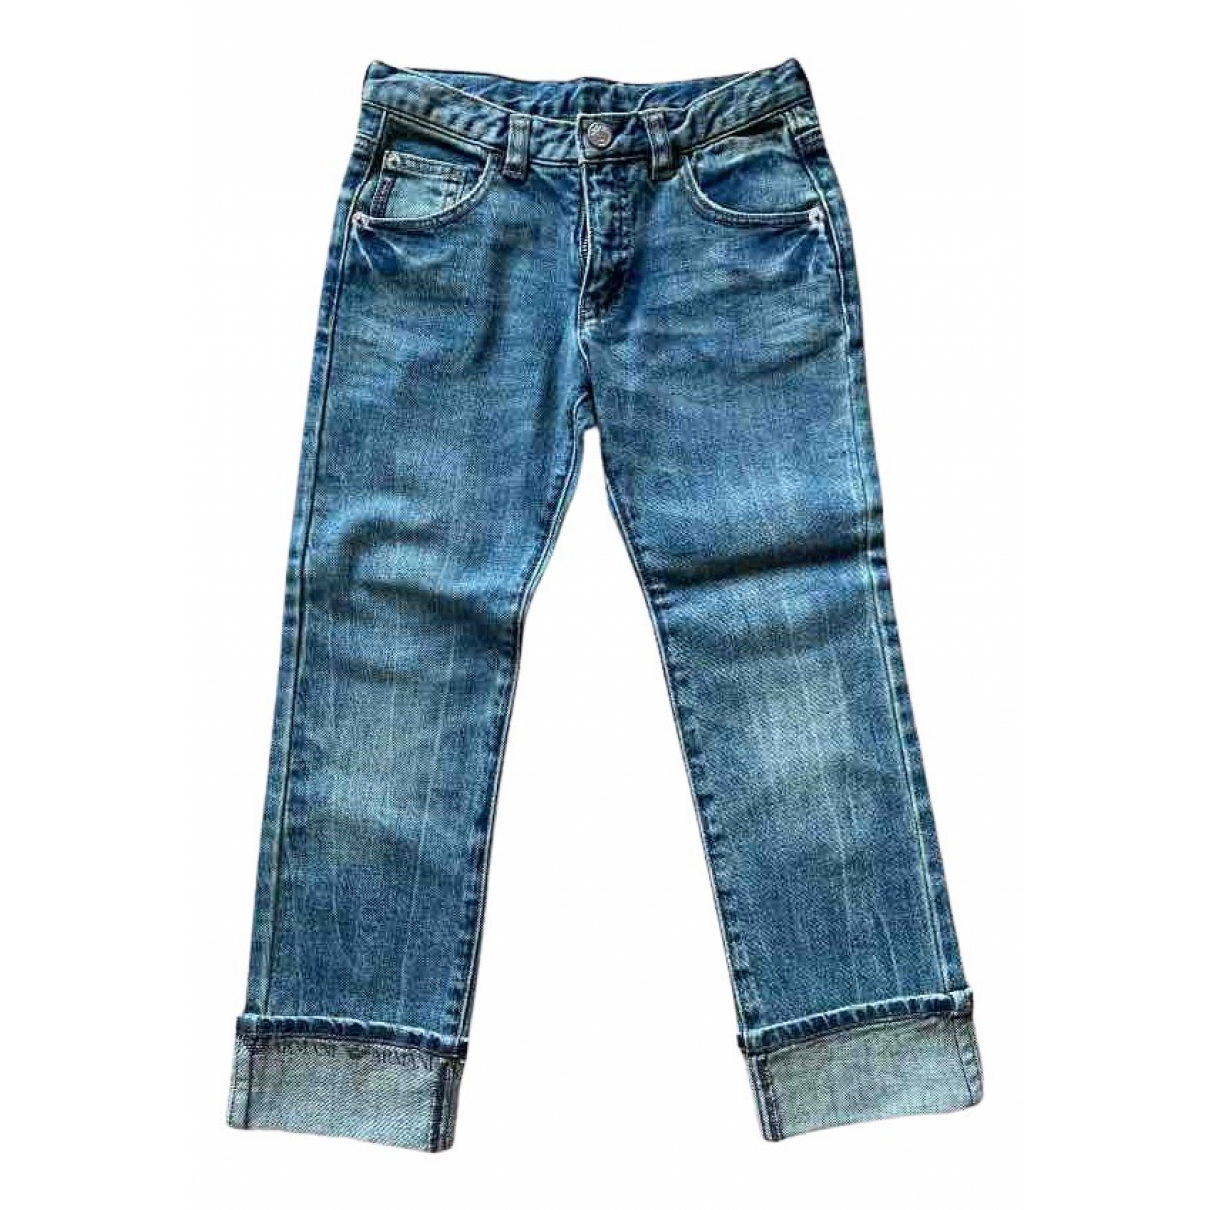 Vaquero Armani Jeans